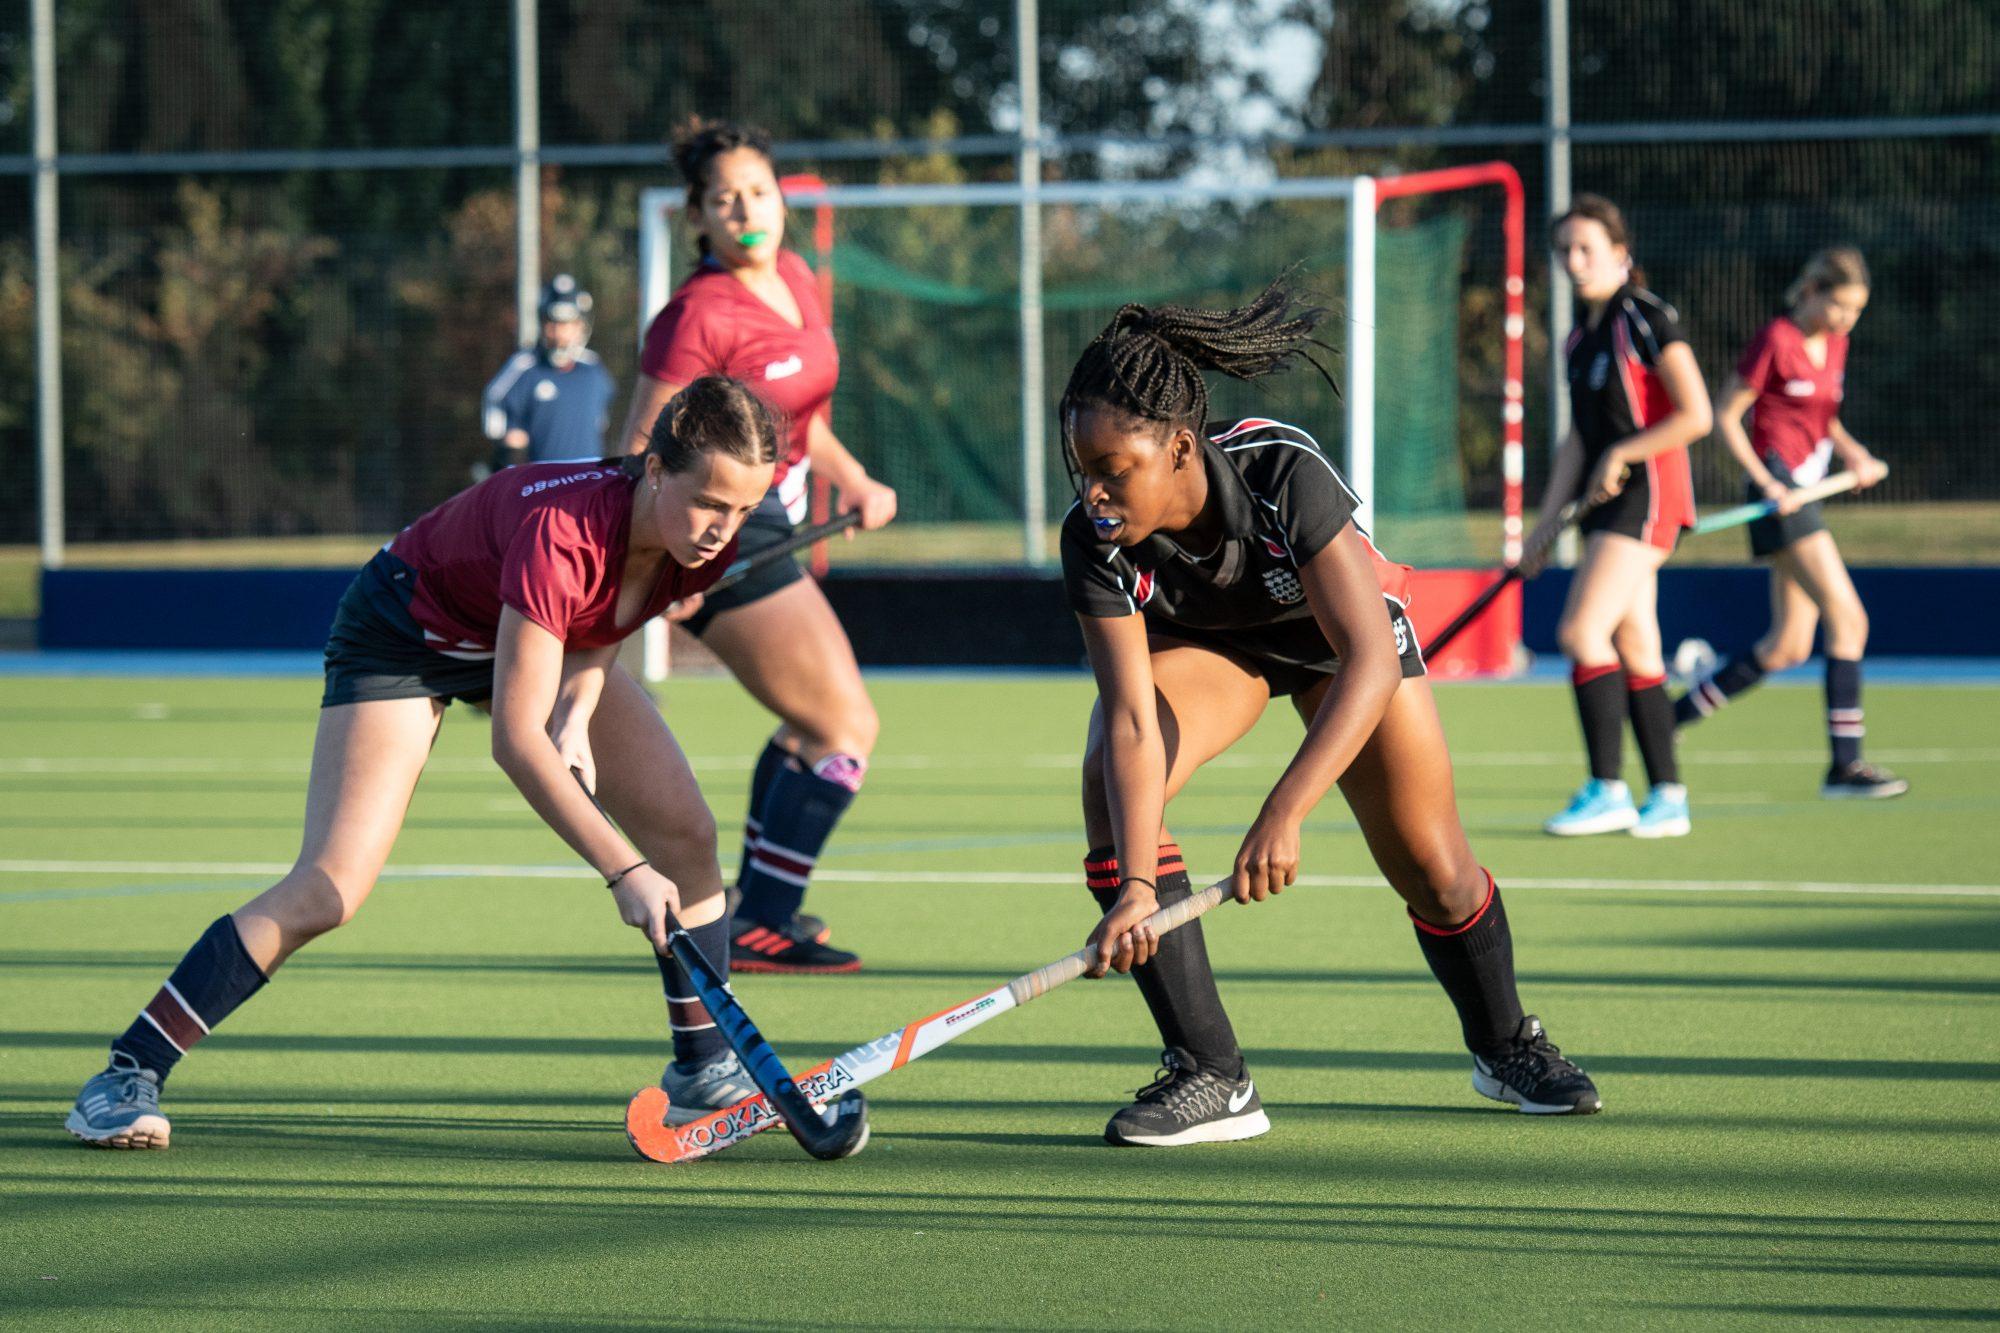 Magdalen College School Sixth Form pupils play hockey